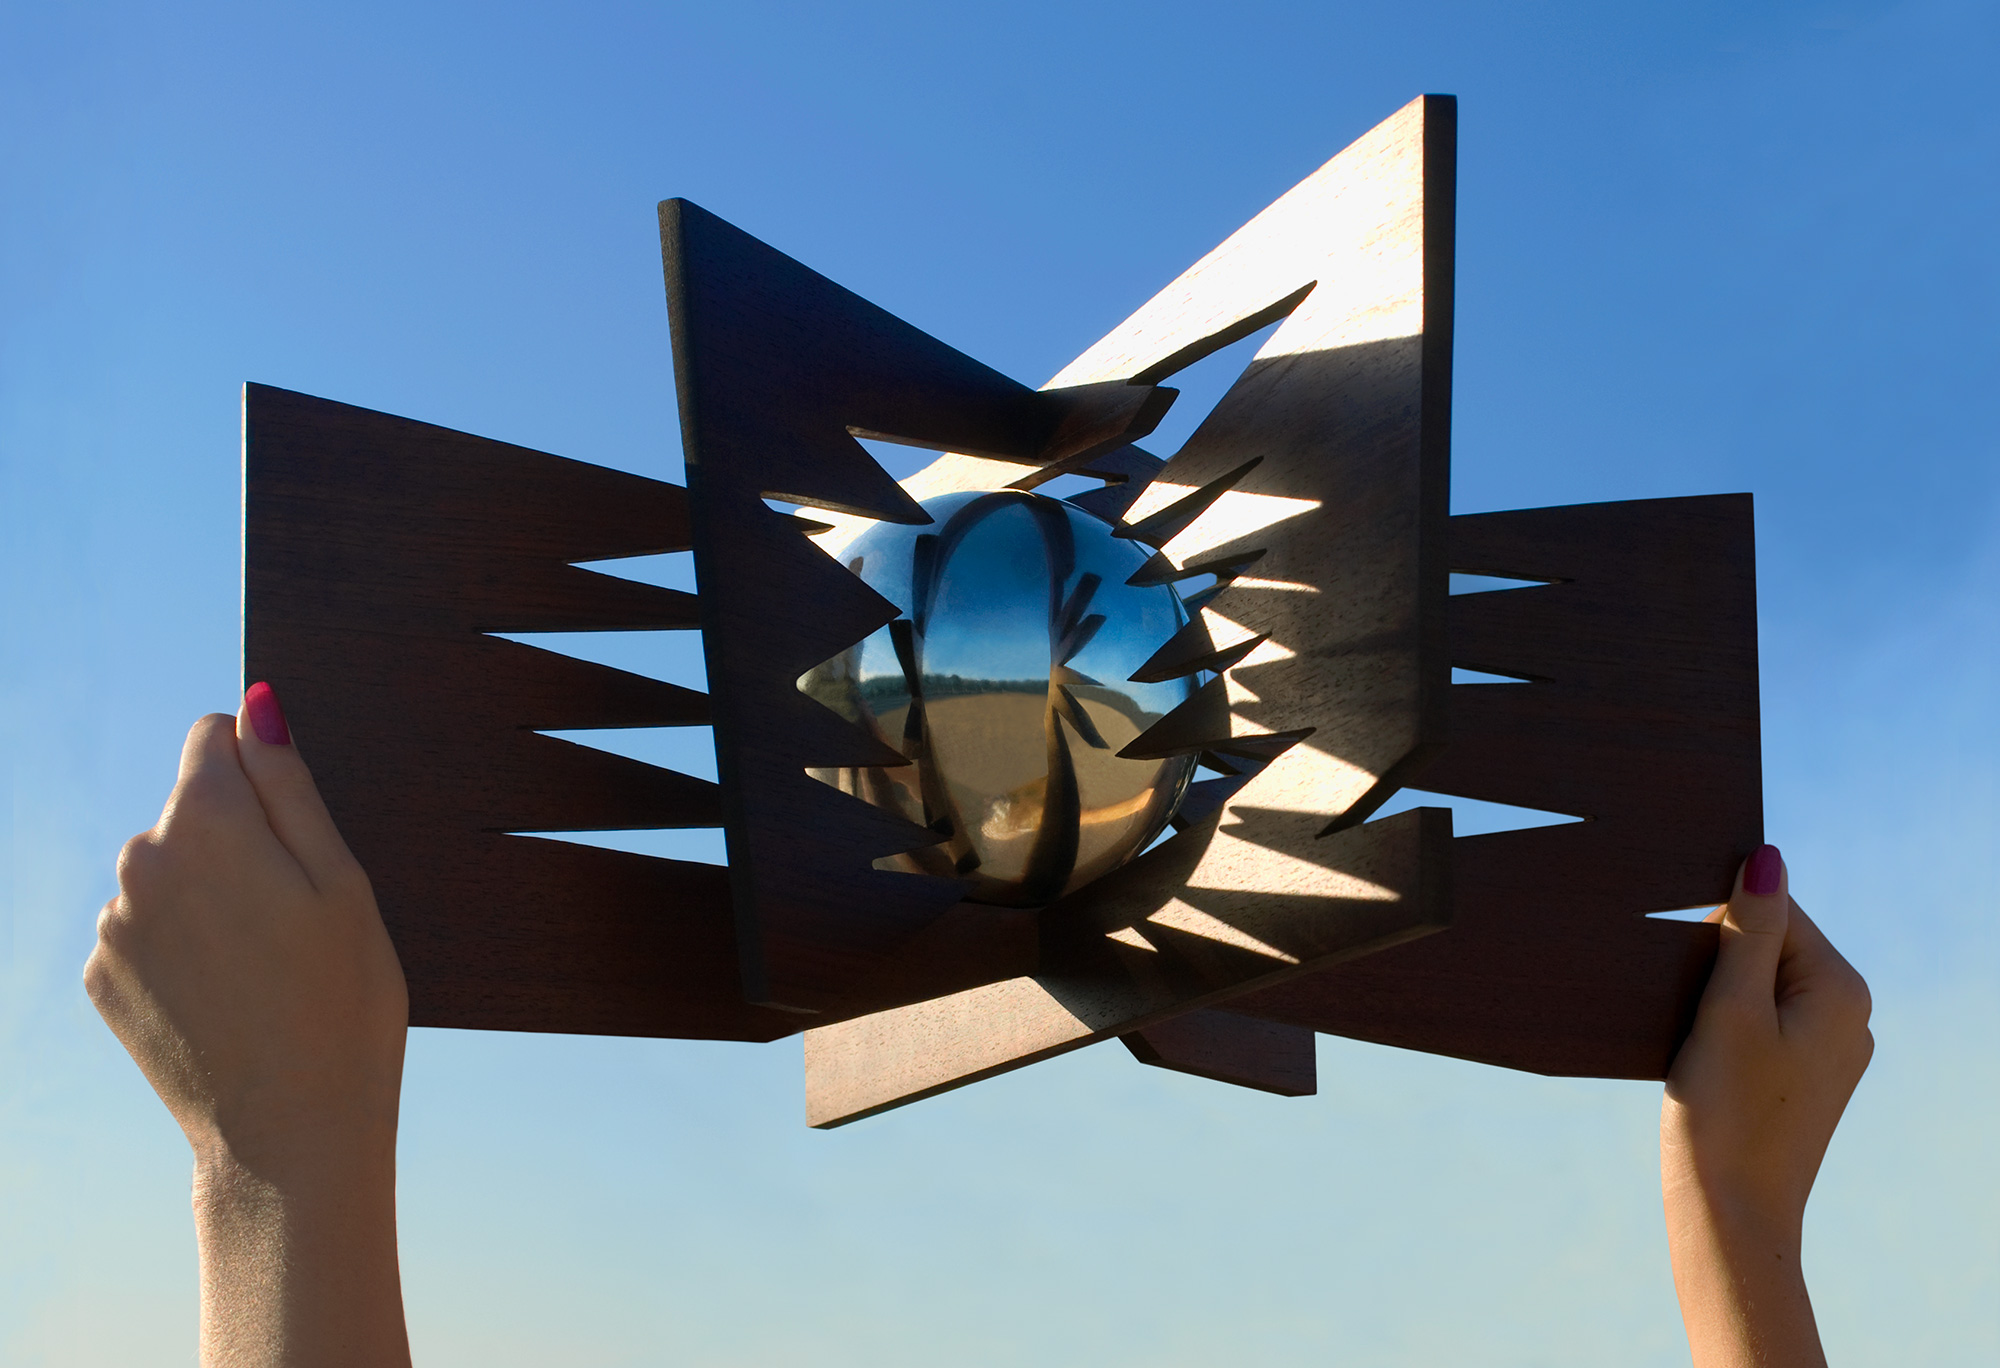 ron-miriello-grafico-san-diego-100-worlds-project-sculpture-globe-Miriello-branding-officina-13jpg